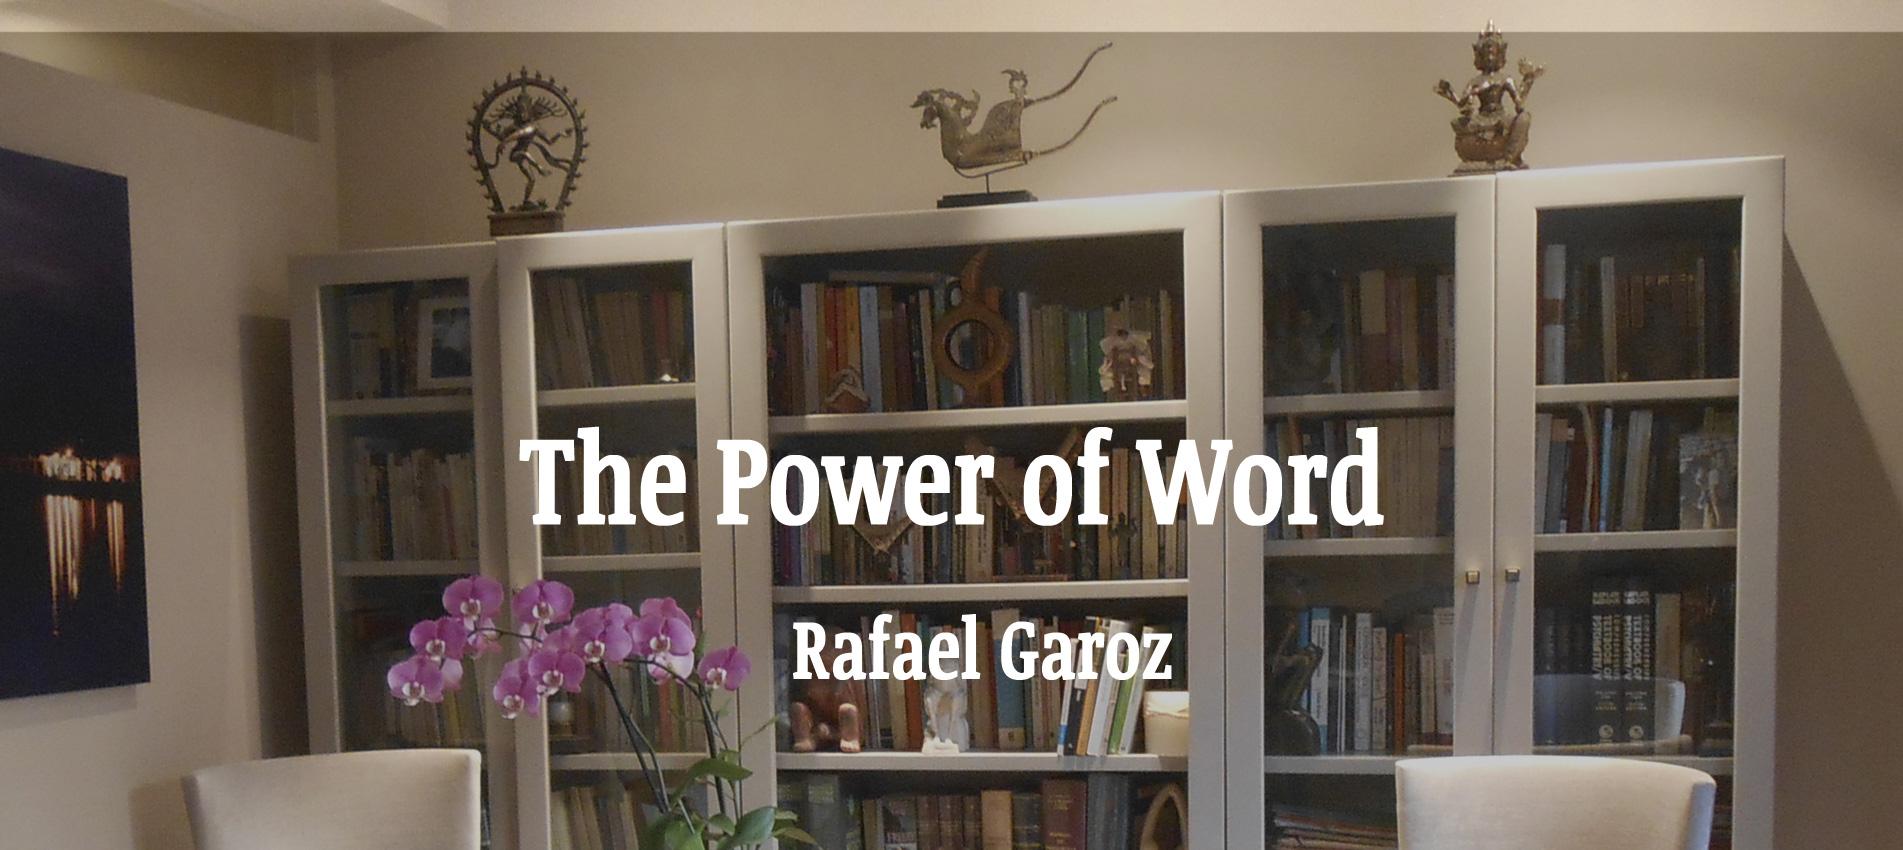 the-power-of-word-rafael-garoz